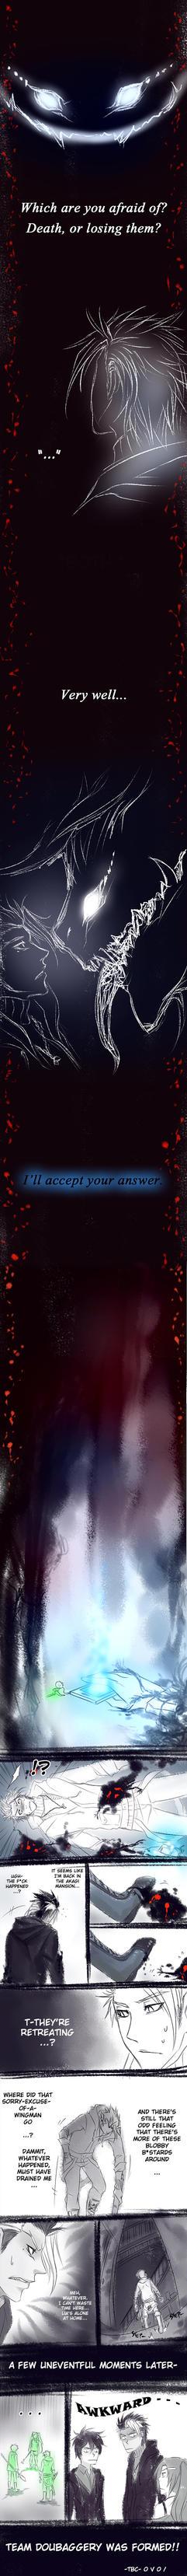 MM: Ch 7: Ashley's side - Part 2 by cherubchan